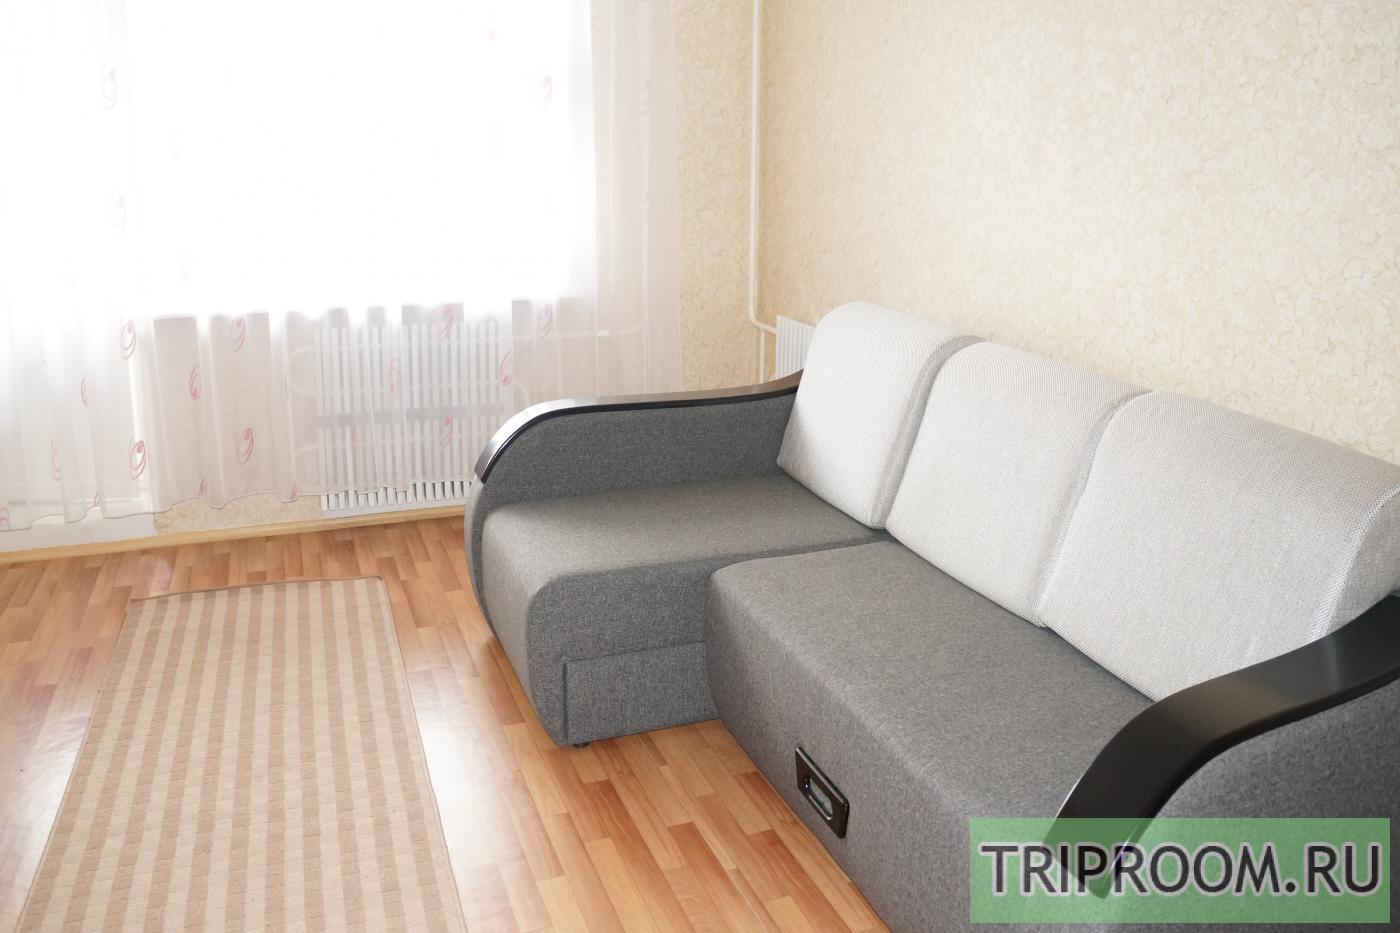 2-комнатная квартира посуточно (вариант № 4711), ул. 60-летия ВЛКСМ улица, фото № 2